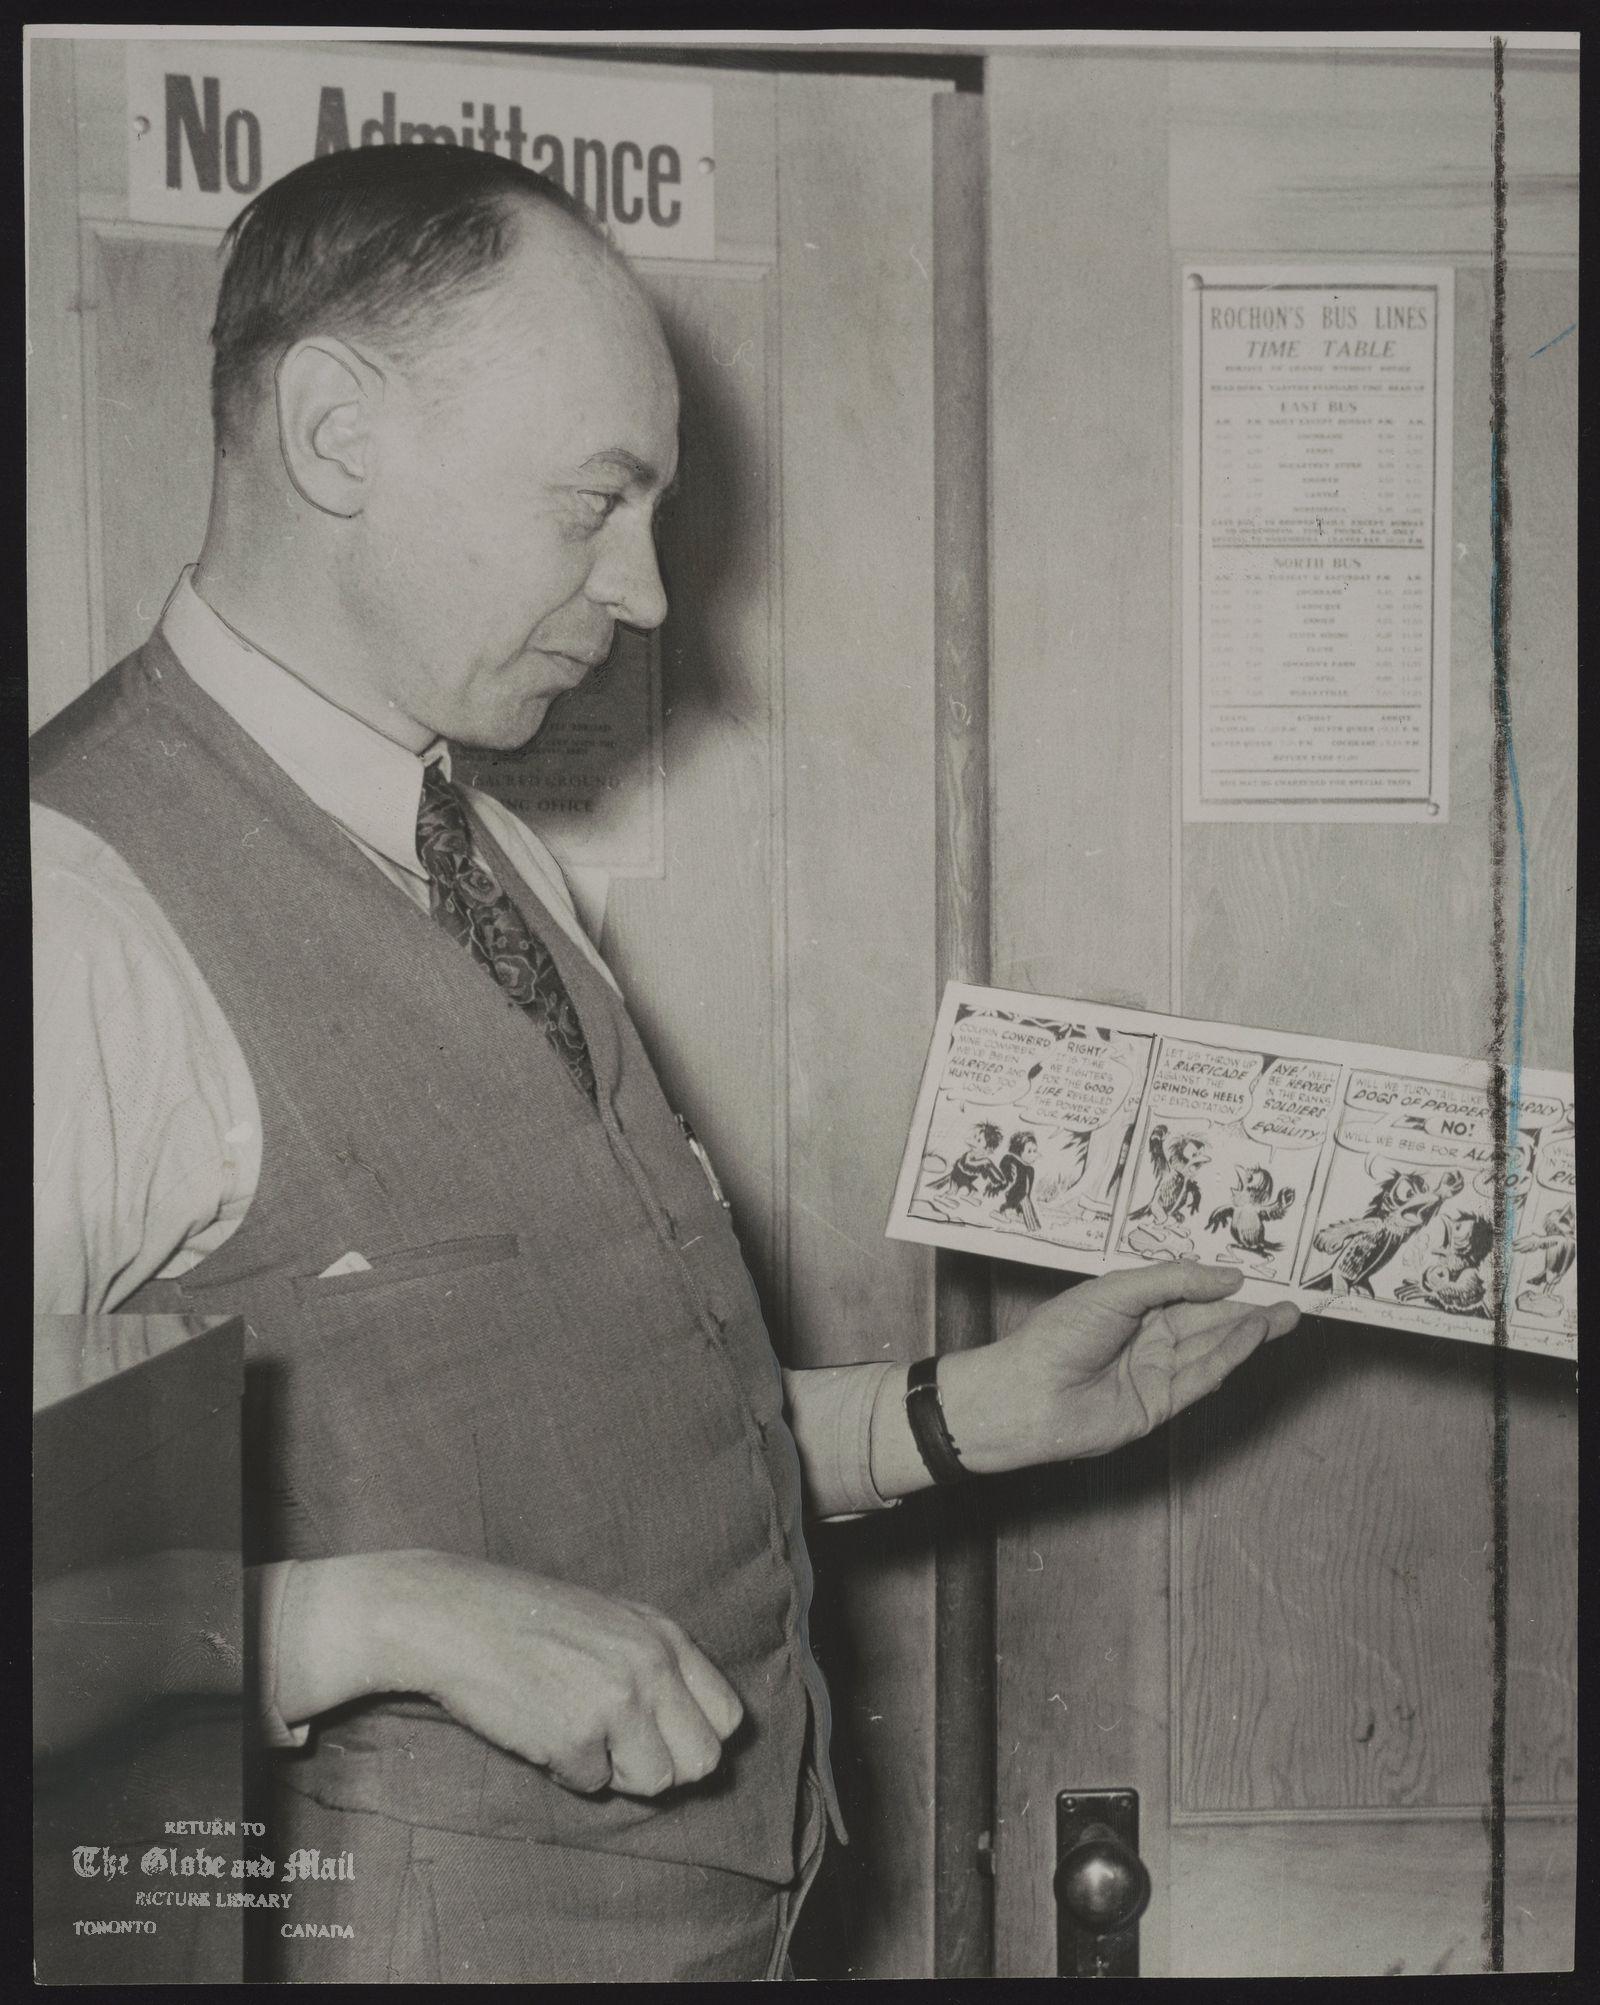 Pogo Put in Same Class as Gulliver's Travels Walt Kelly sends original comic strip to Editor Harold Wills [Cochrane Northland Post] Editorial Touches Pogo's Pop Strip Thanks Cochrane Writer